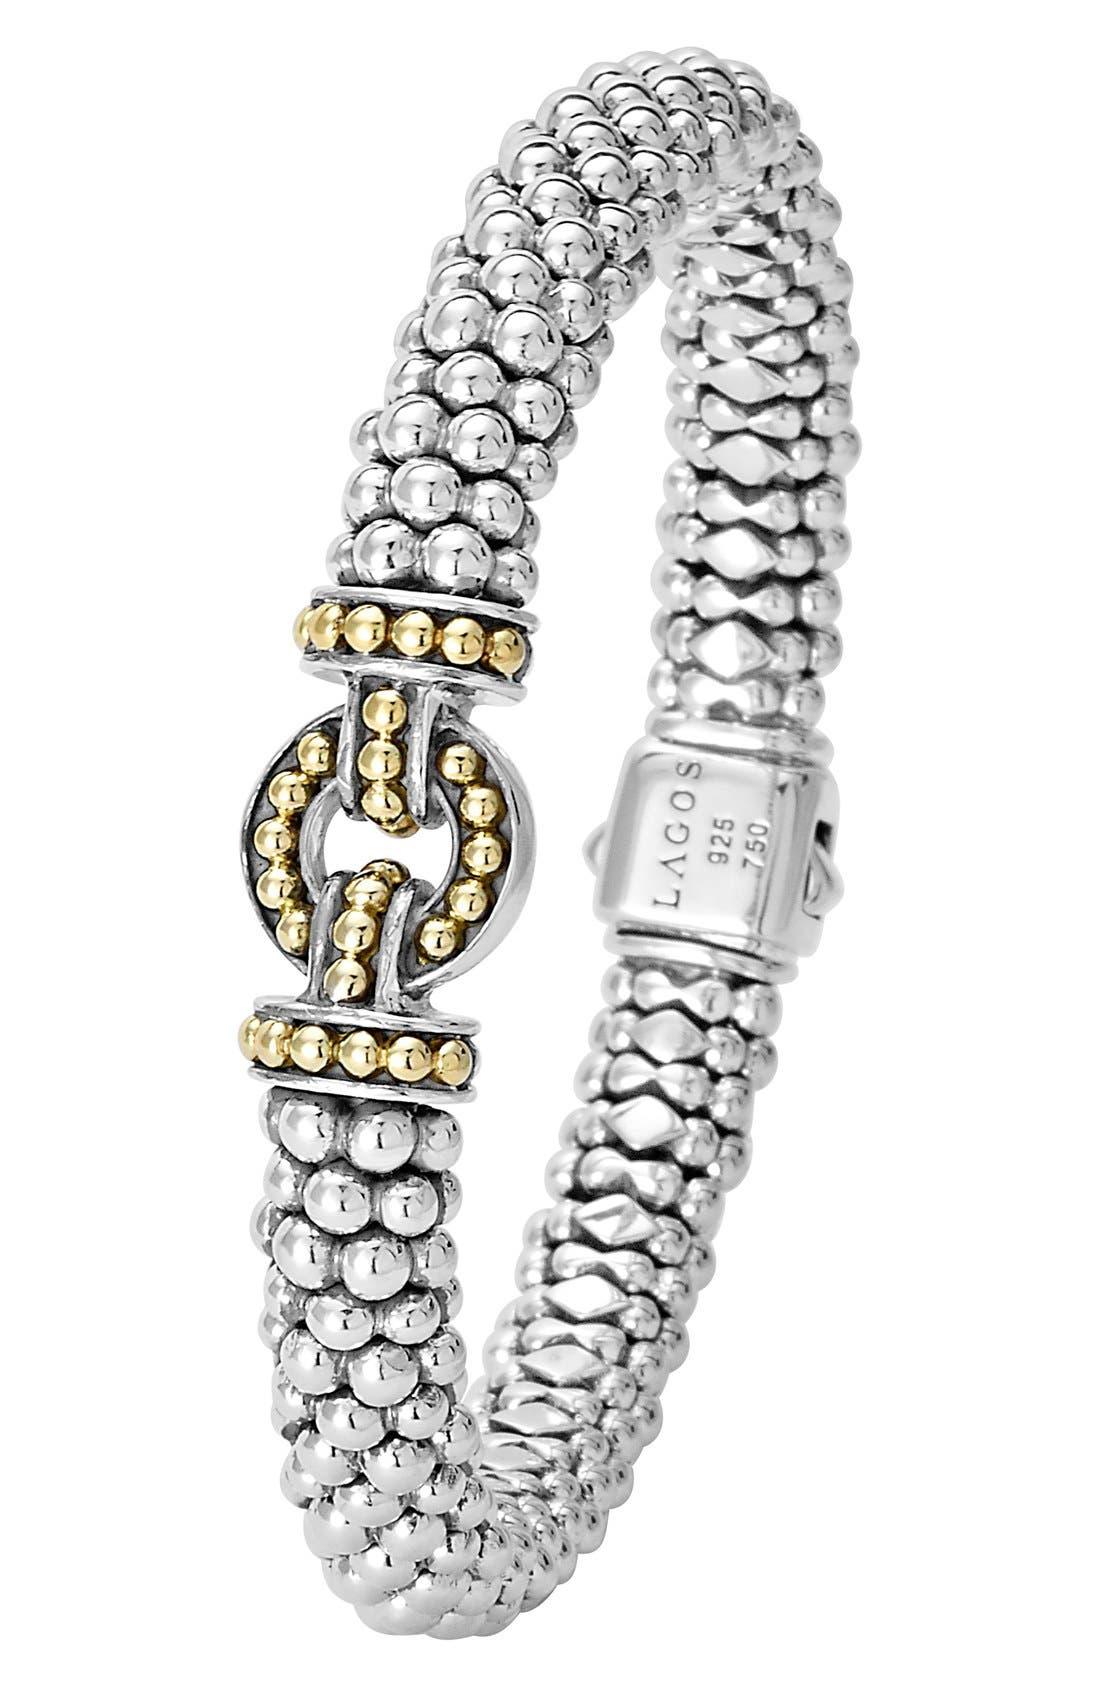 'Enso' Two-Tone Rope Caviar Bracelet,                             Alternate thumbnail 2, color,                             SILVER/ GOLD